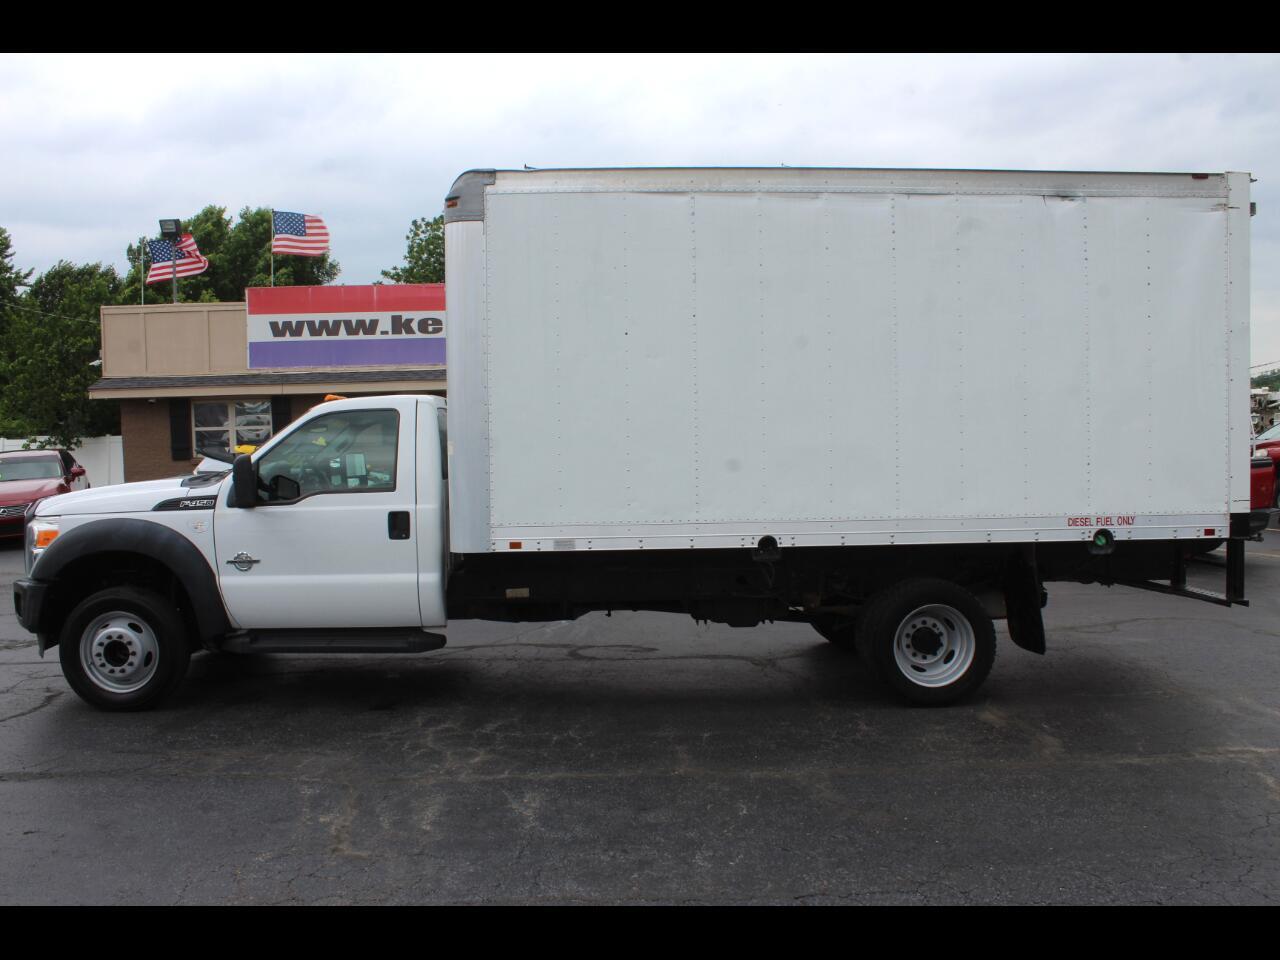 2012 Ford F-450 SD XL Regular Cab DRW 16 ft. Box Truck